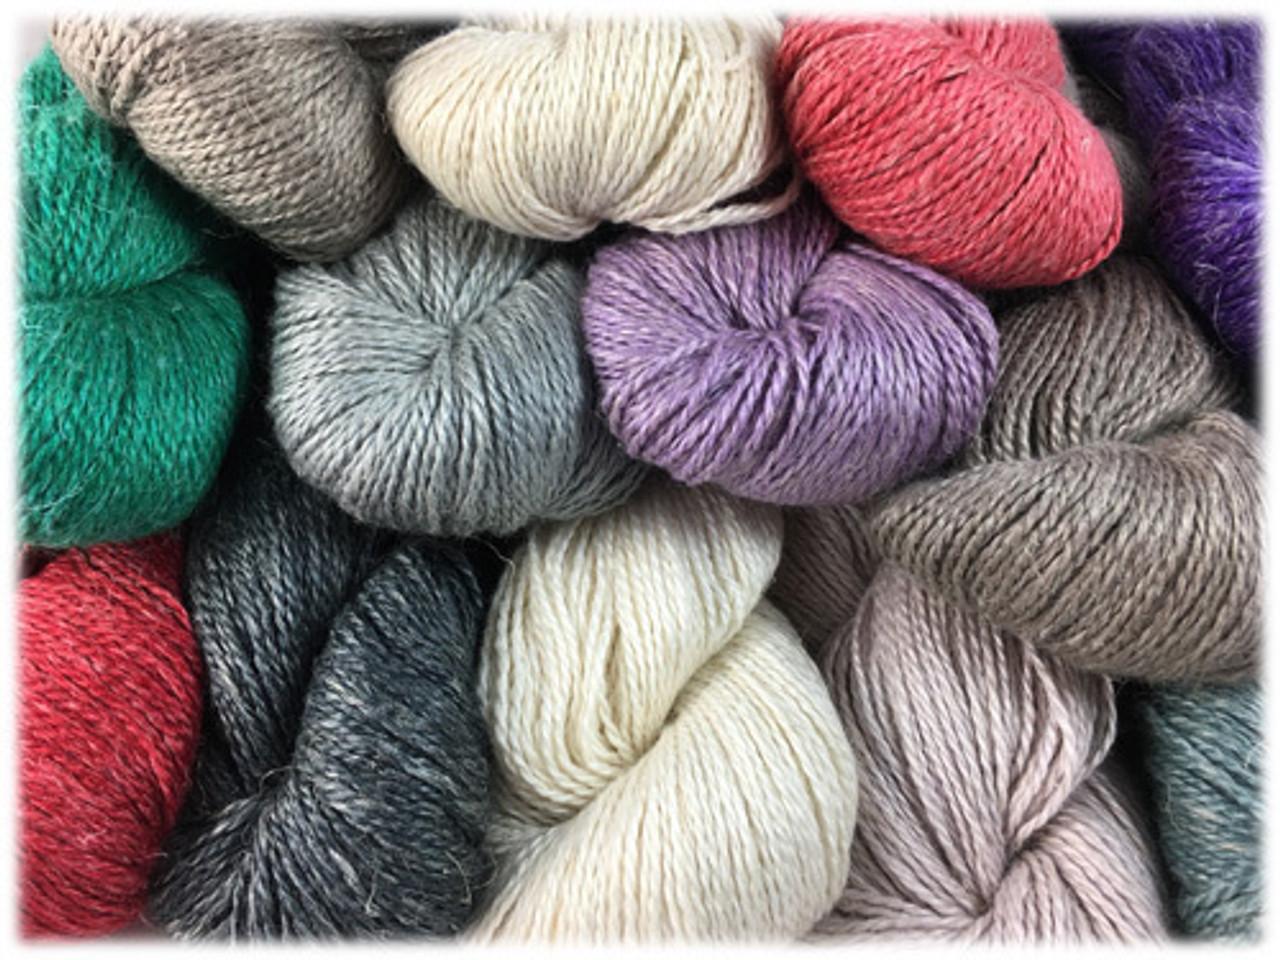 HiKoo Yarn - Rylie, Baby Alpaca, Mulberry Silk, and Linen